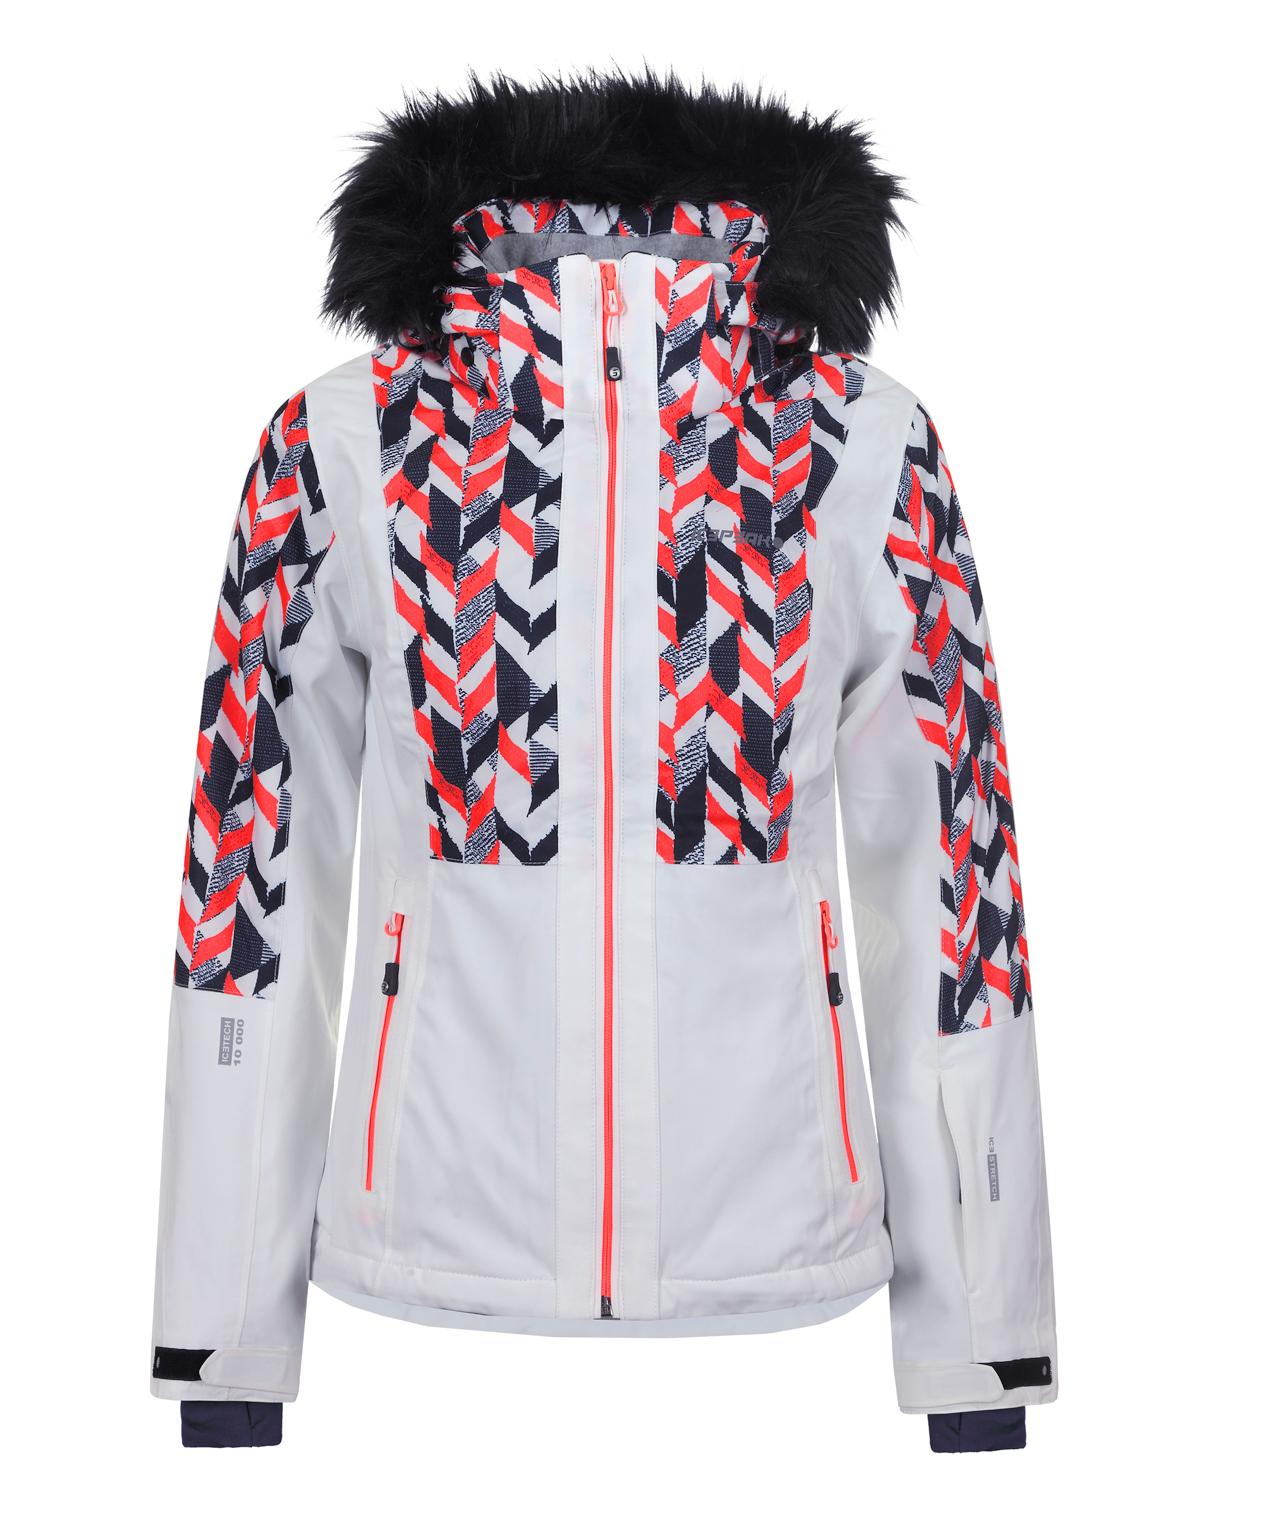 a6bbdb76a Dámska lyžiarska bunda Icepeak Nancy biela col. 980